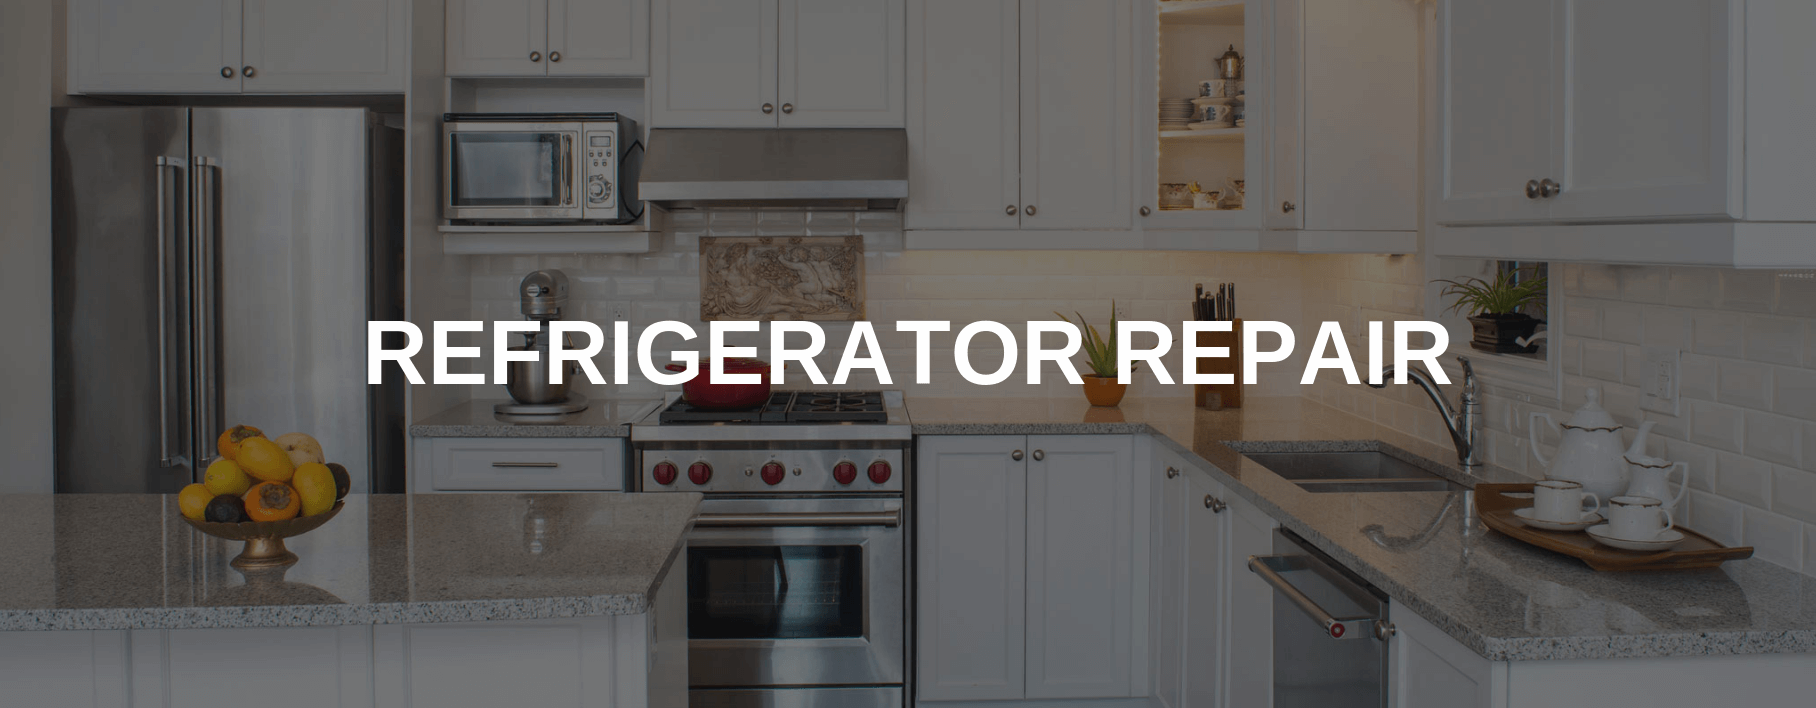 refrigerator repair roseville